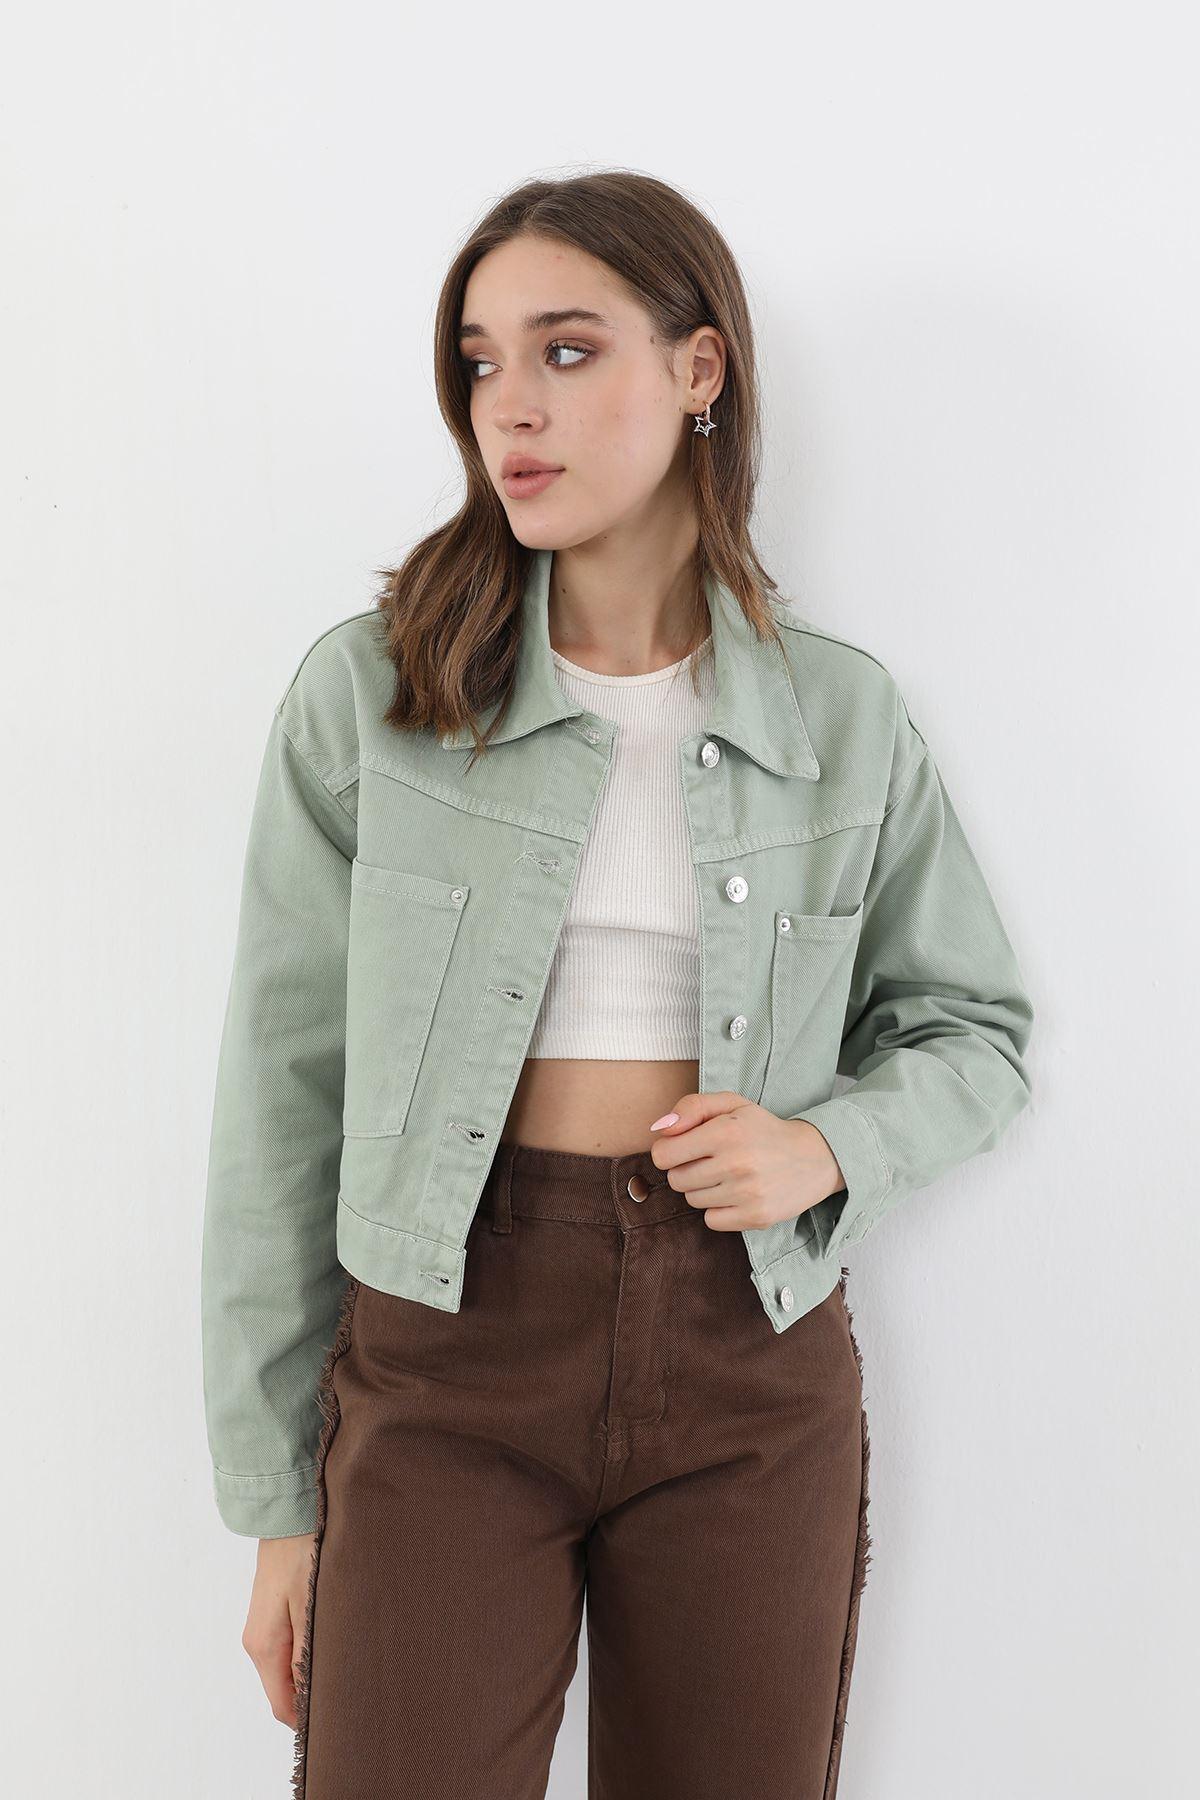 Çift Cep Ceket-Haki